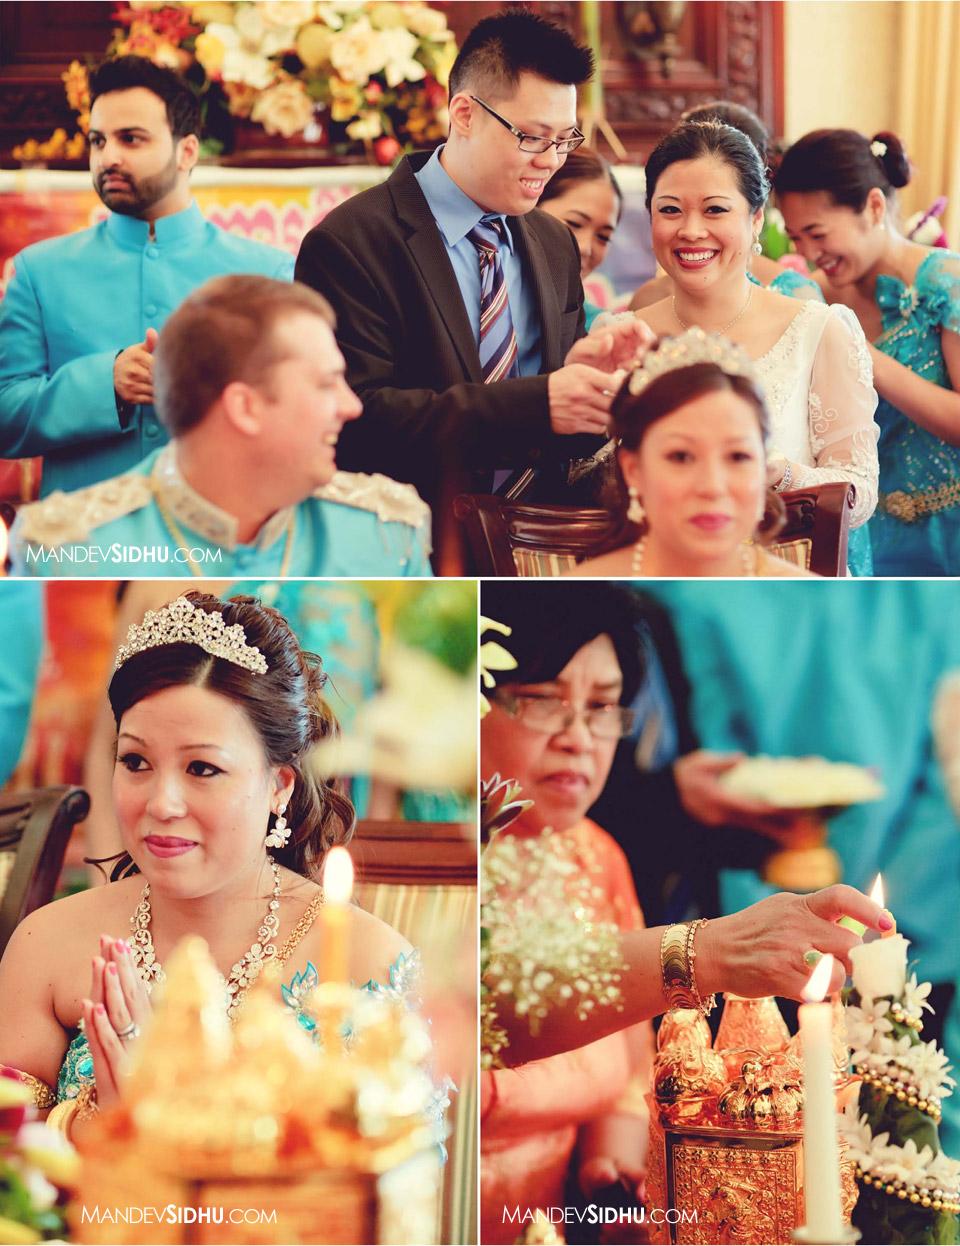 cambodian-khmer-wedding-hair-cutting-ceremony-gaat-sah